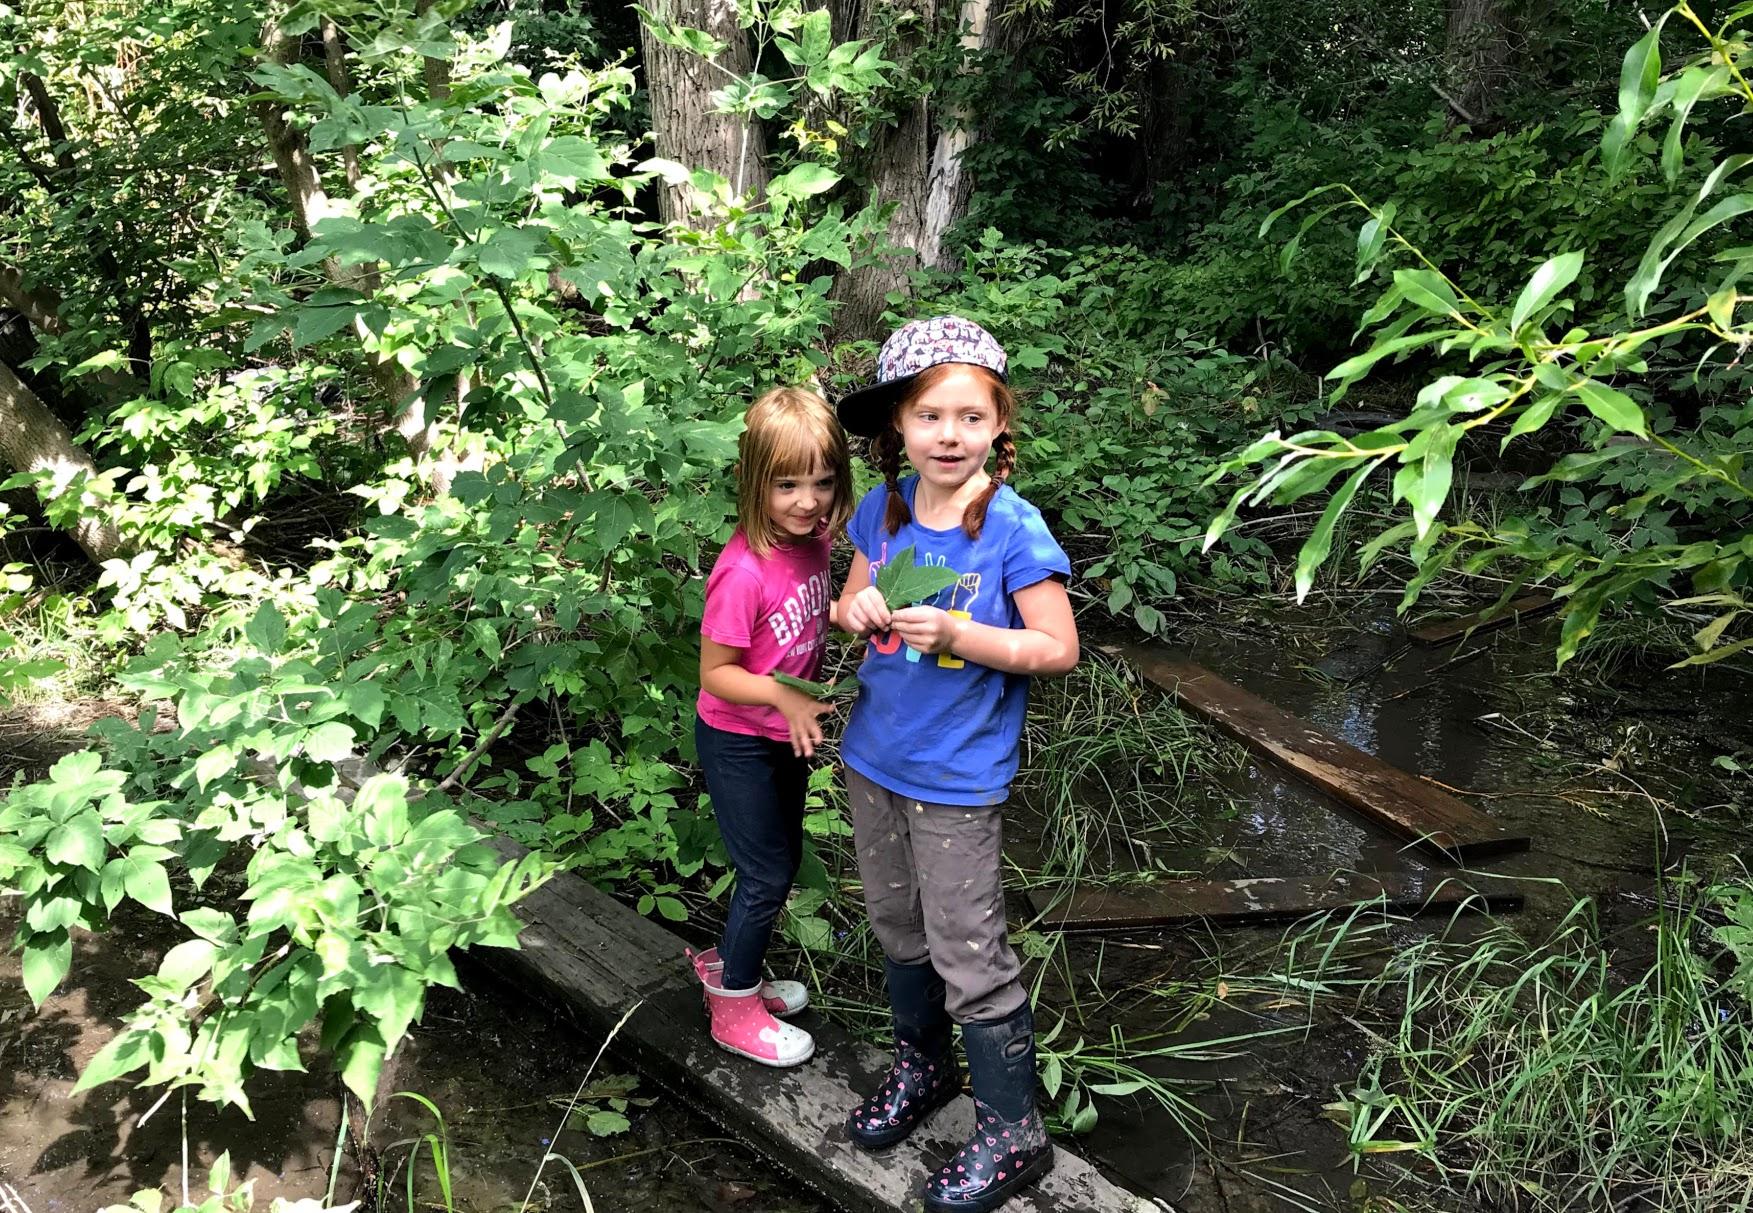 Castaways - Summer Camp (ages 6-10), August 16-20